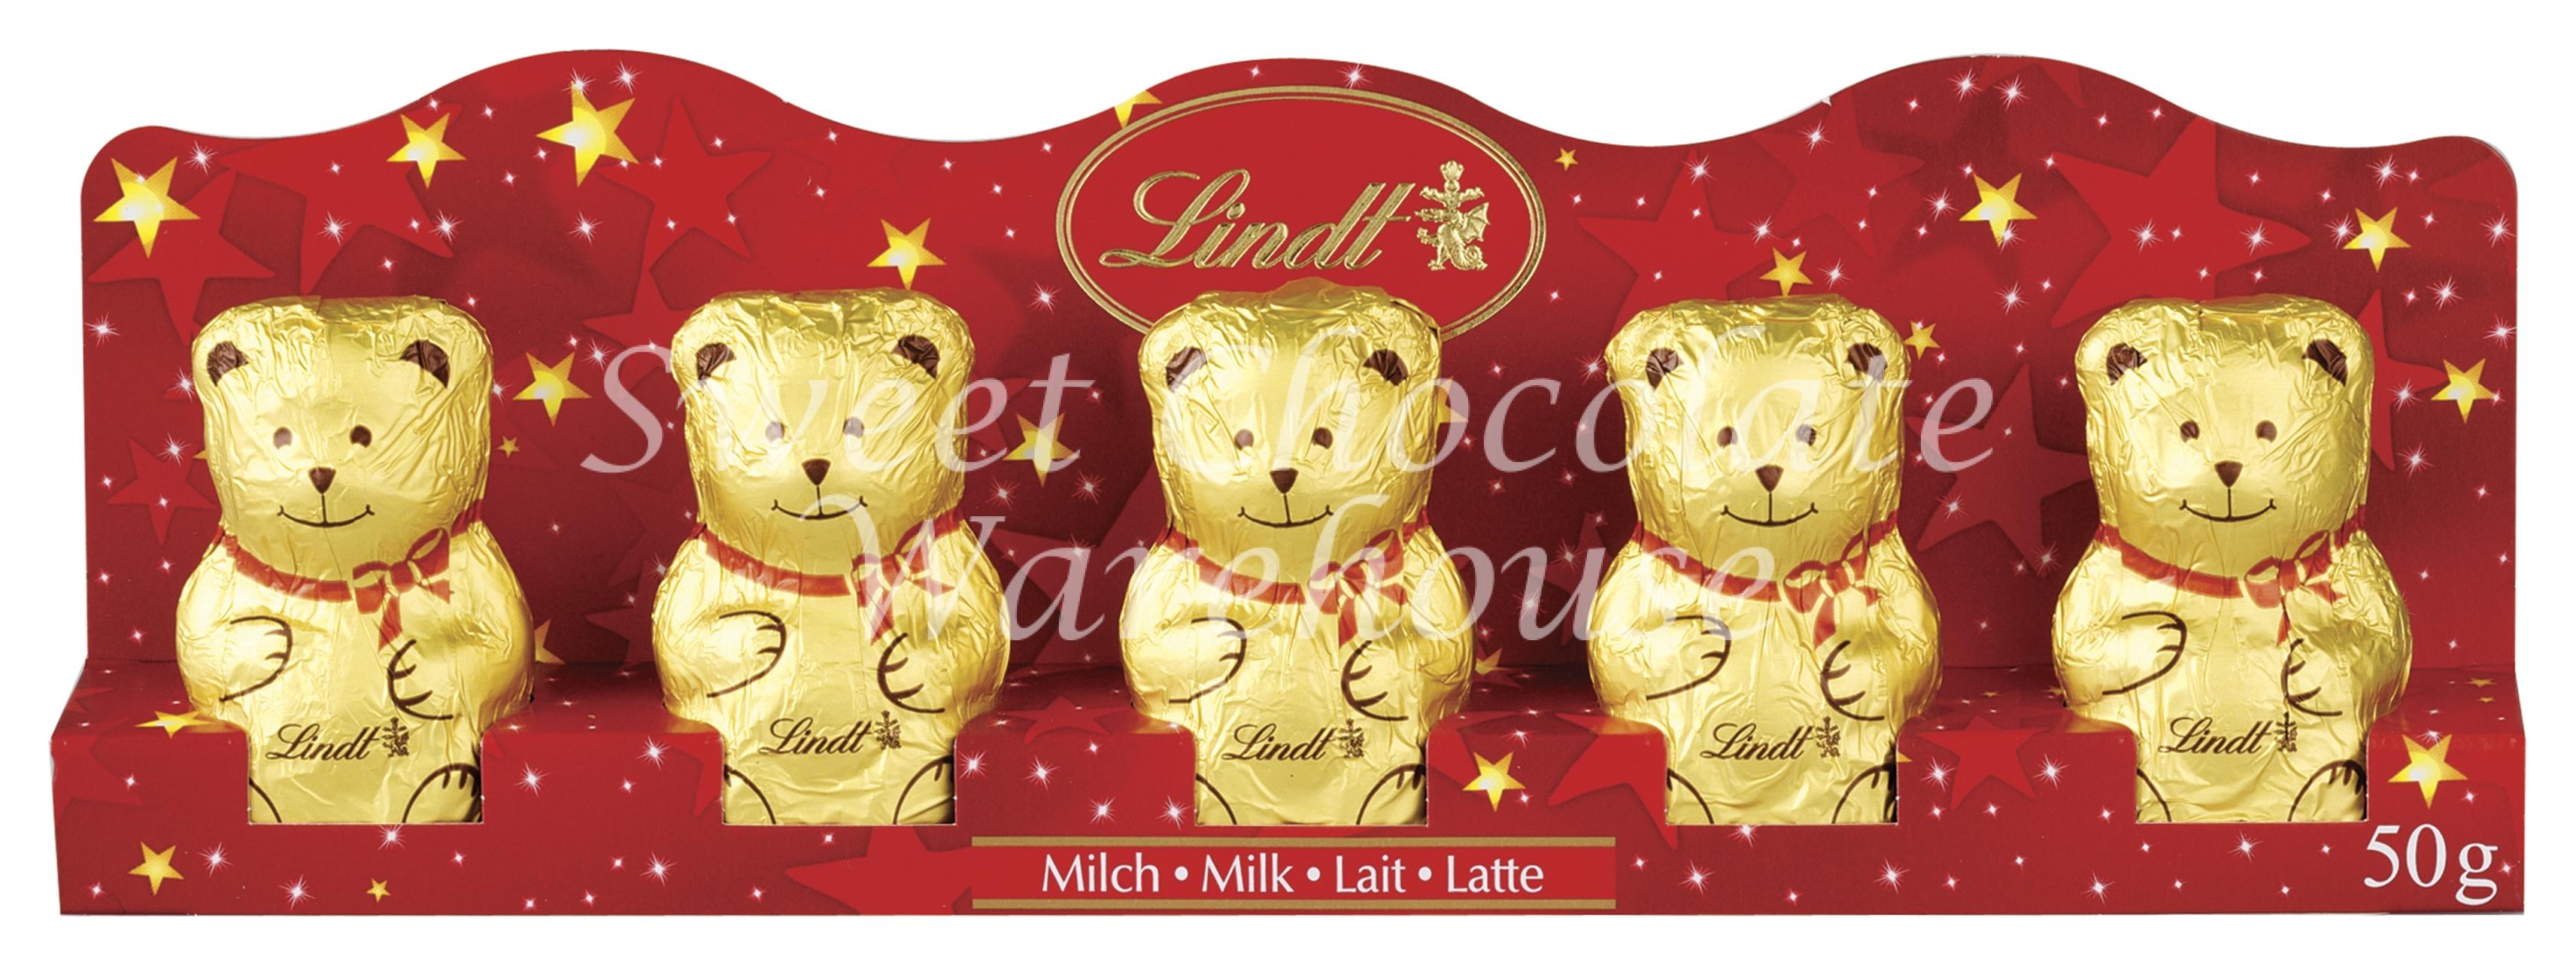 lindt 5 beutel kaufen teddy gratis